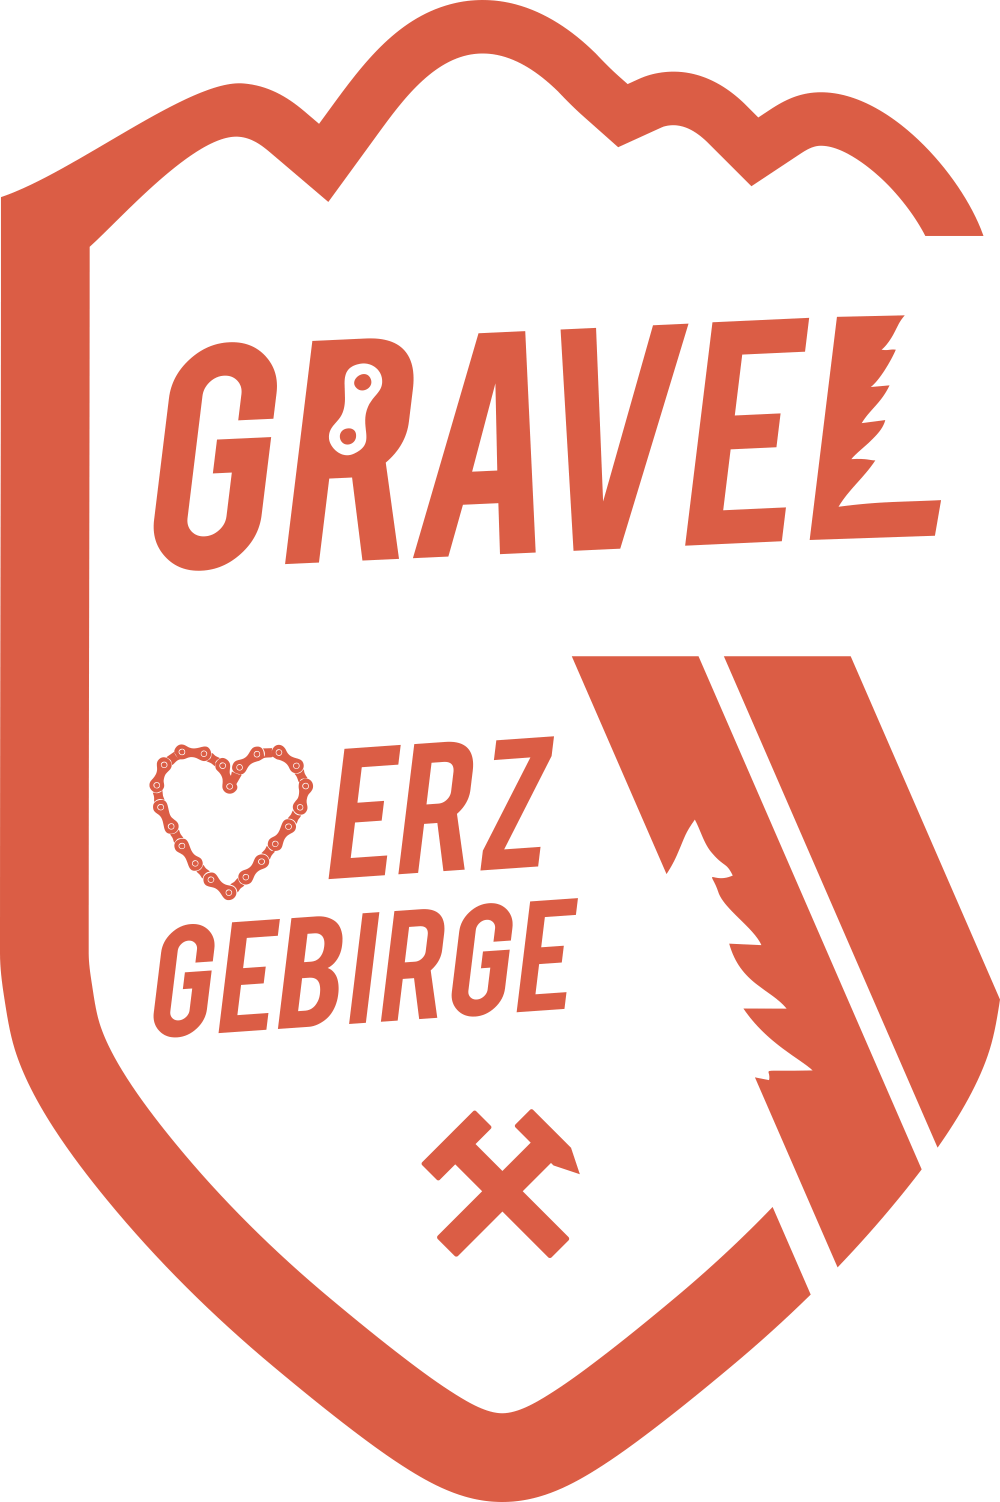 GRAVEL Erzgebirge